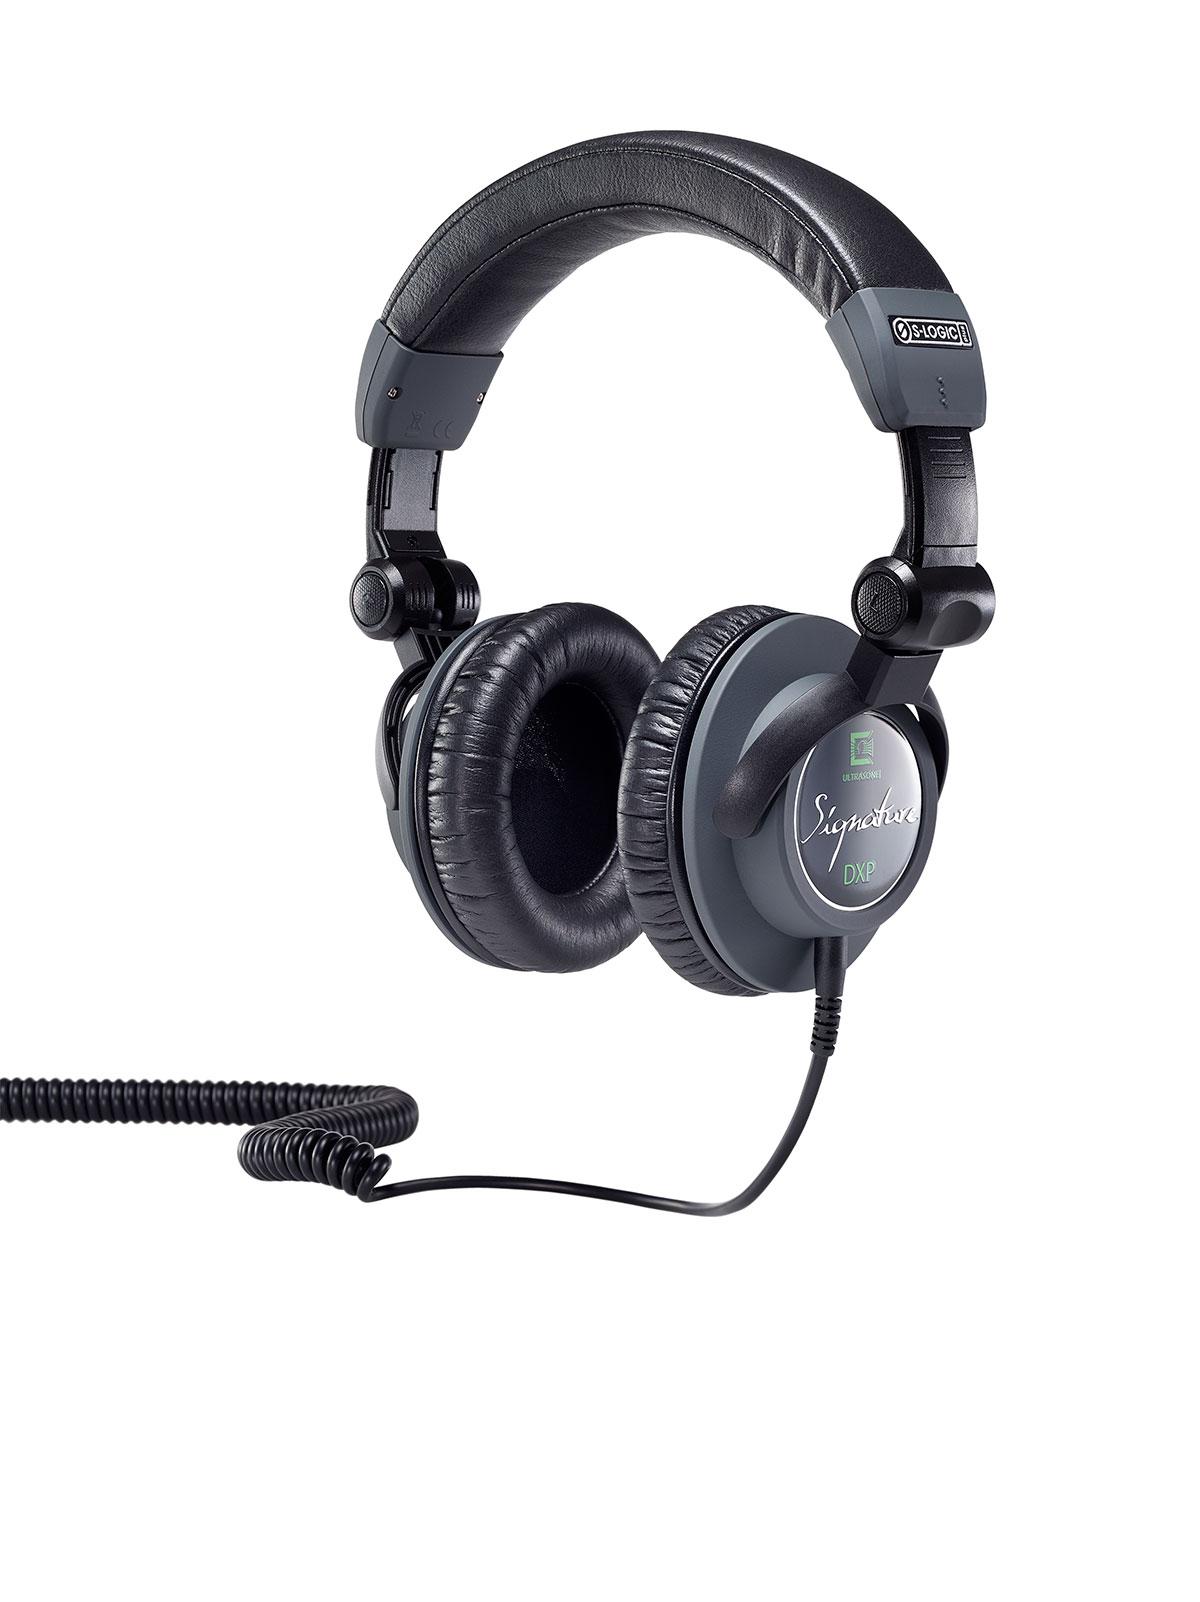 Image of   Ultrasone Signature DXP hovedtelefon